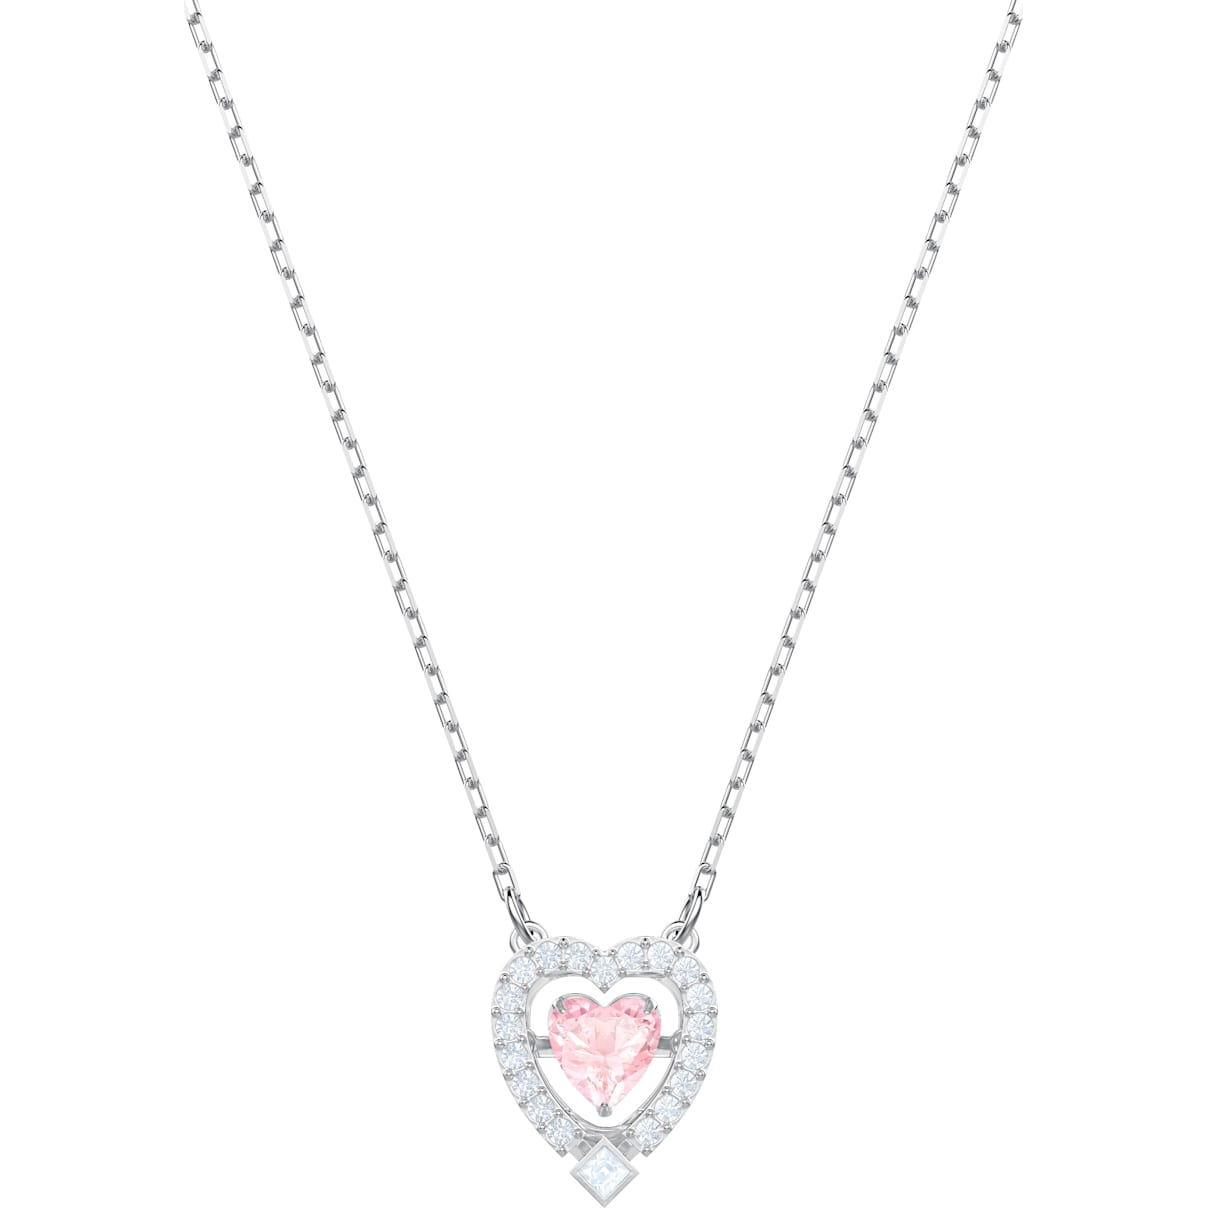 Swarovski Swarovski Sparkling Dance Heart Necklace, Pink, Rhodium plated